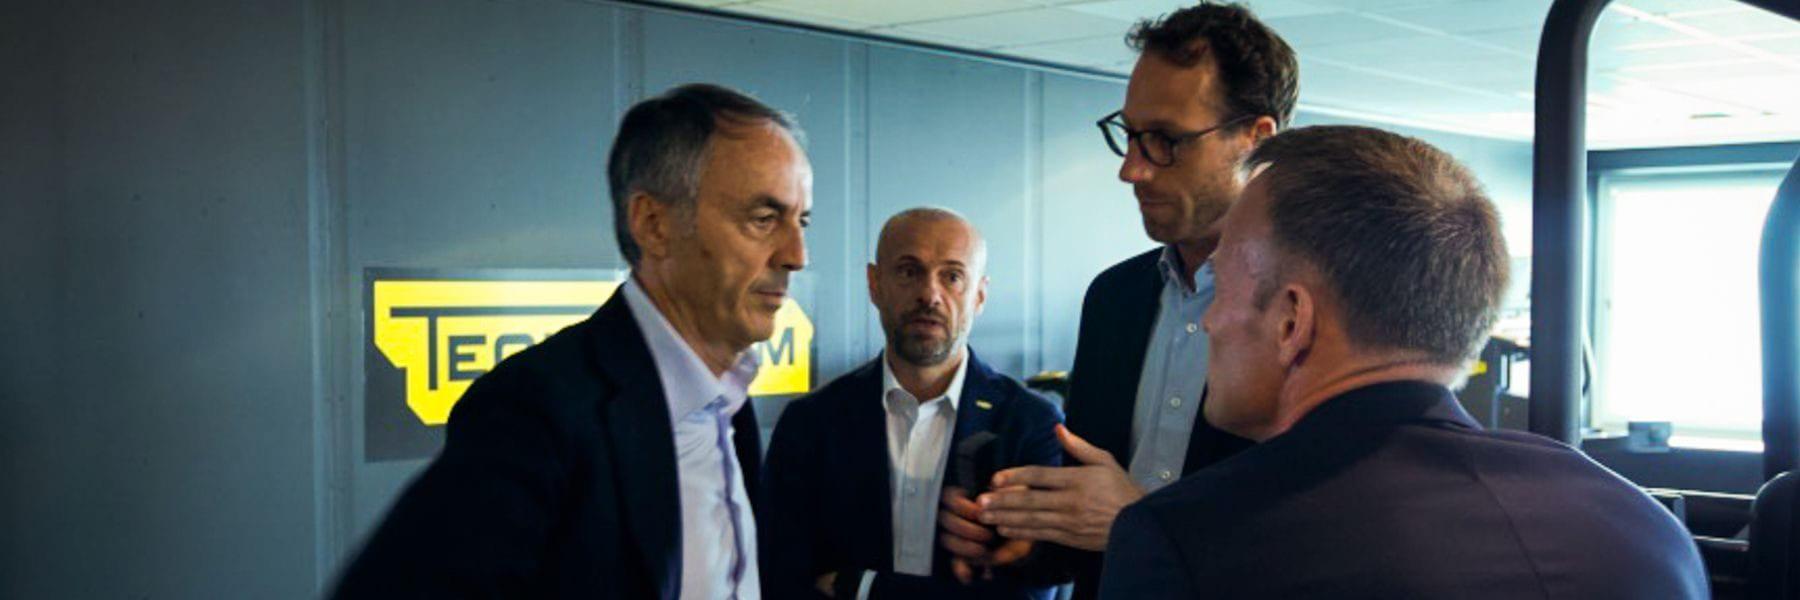 En pratstund med Technogyms grundare Nerio Alessandri